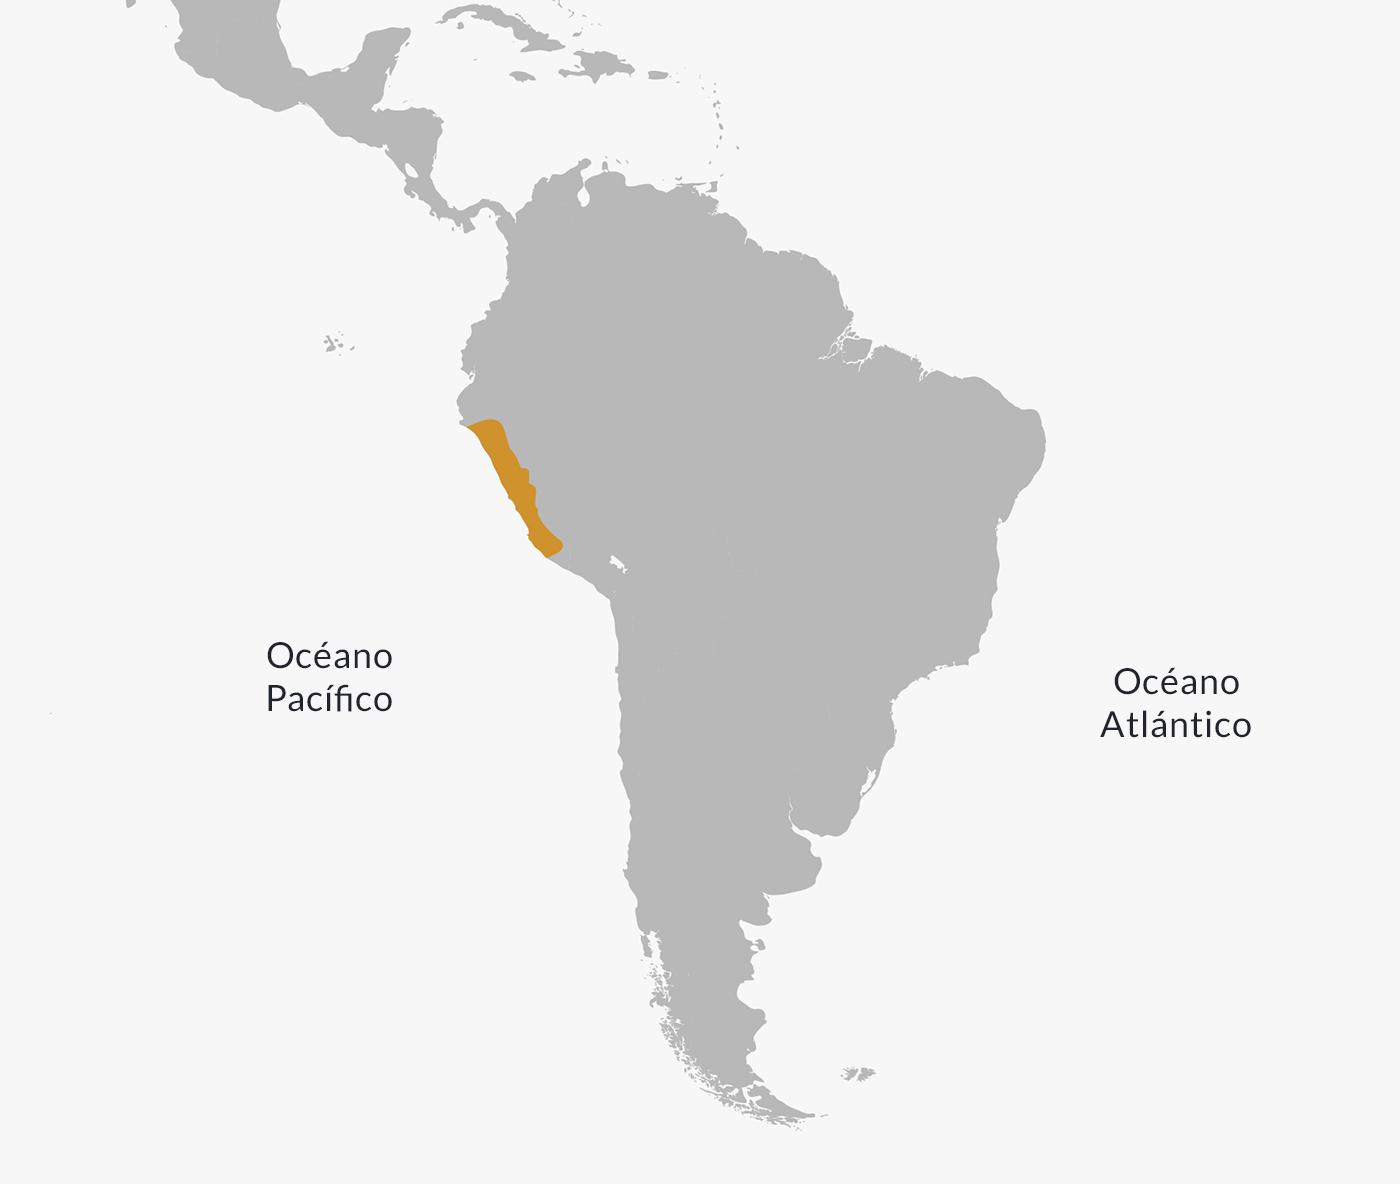 Chavín Civilization | Culture, Economy, Religion & Characteristics